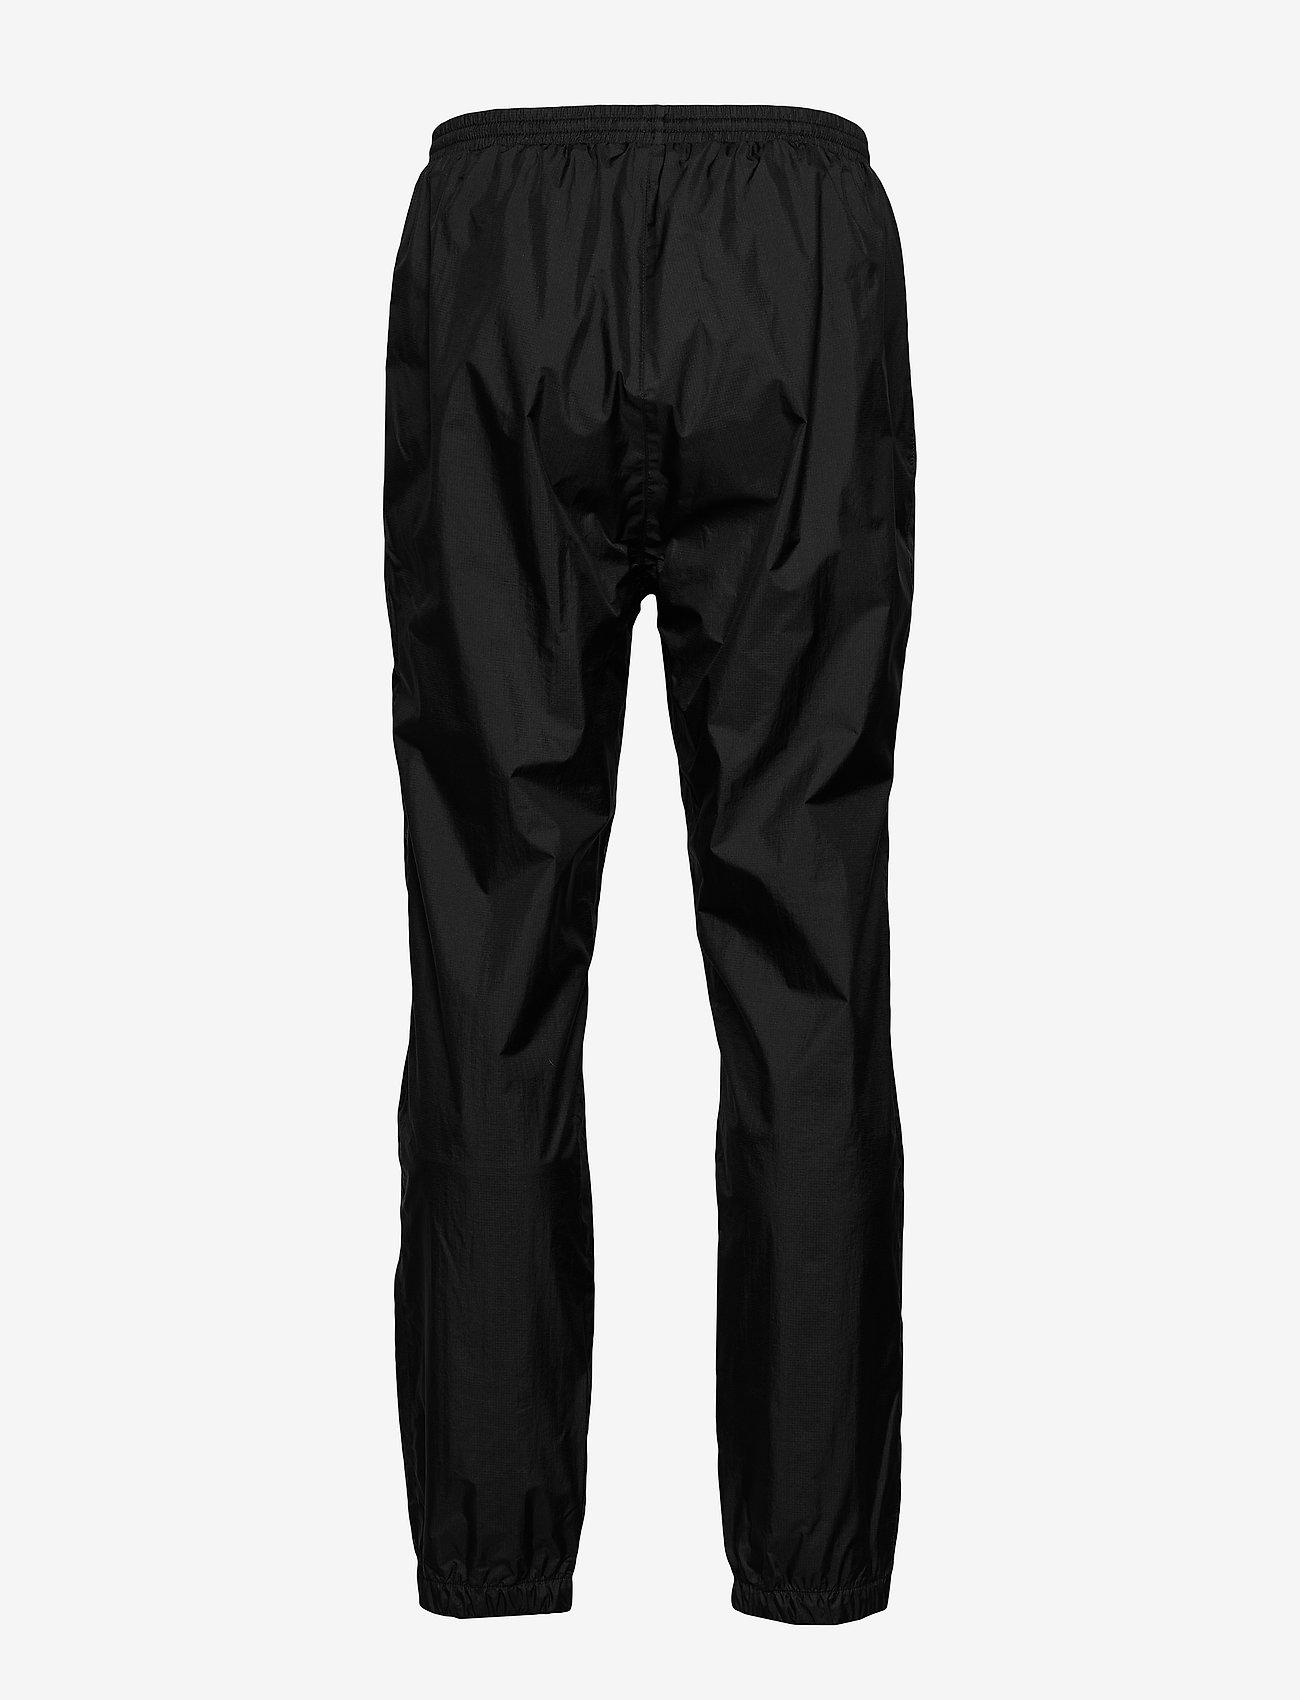 Tretorn Breeze Pants - Jackor & Rockar 011/jet Black